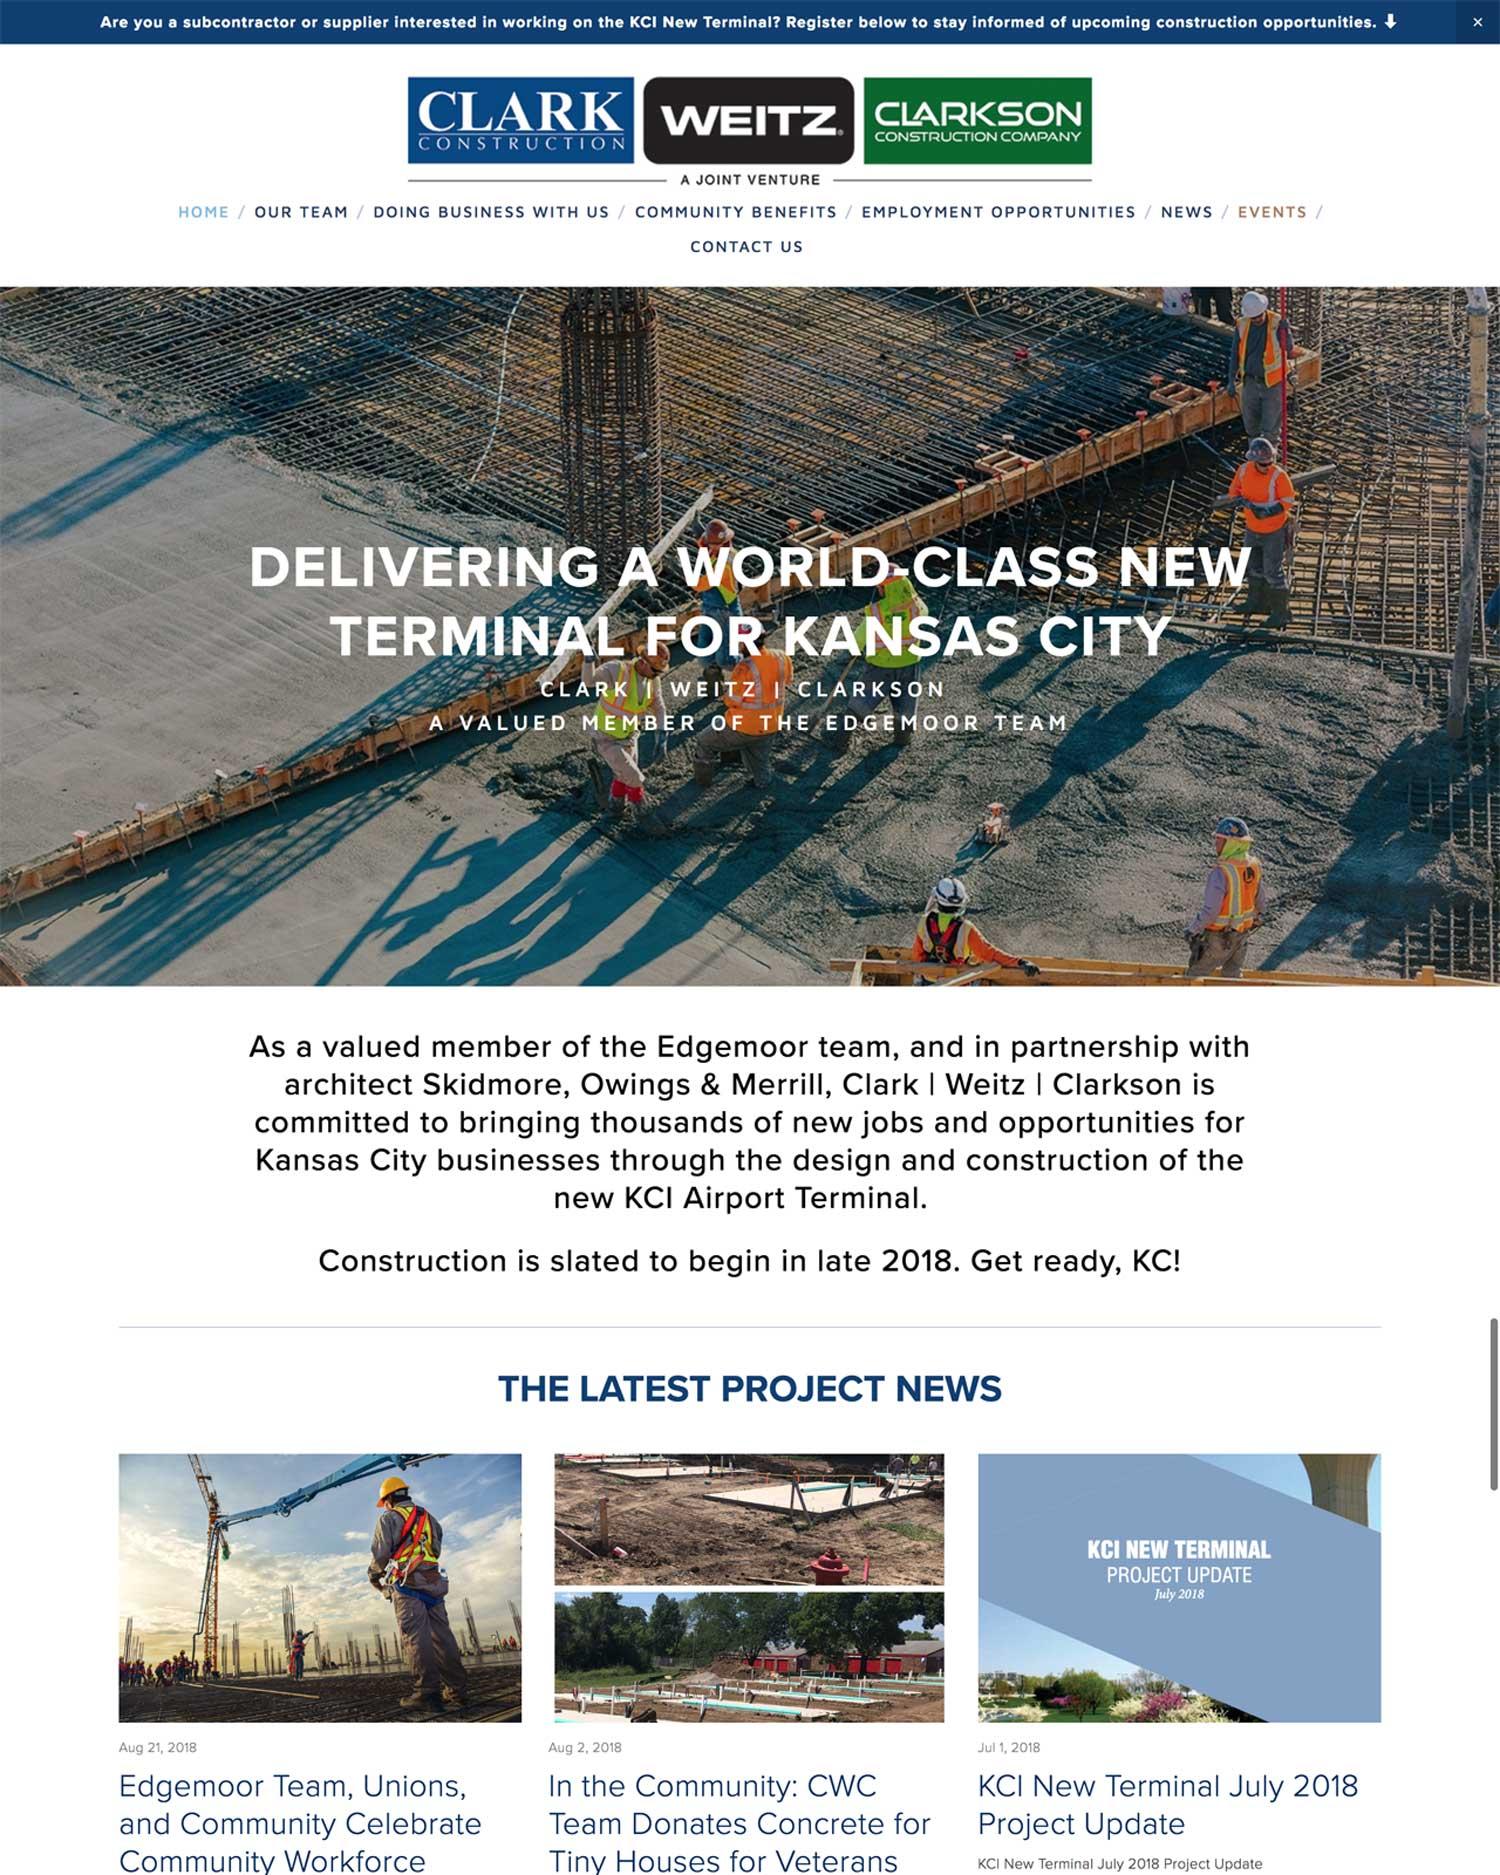 Clark Construction Group - Kansas City International Airport Terminal Construction Project